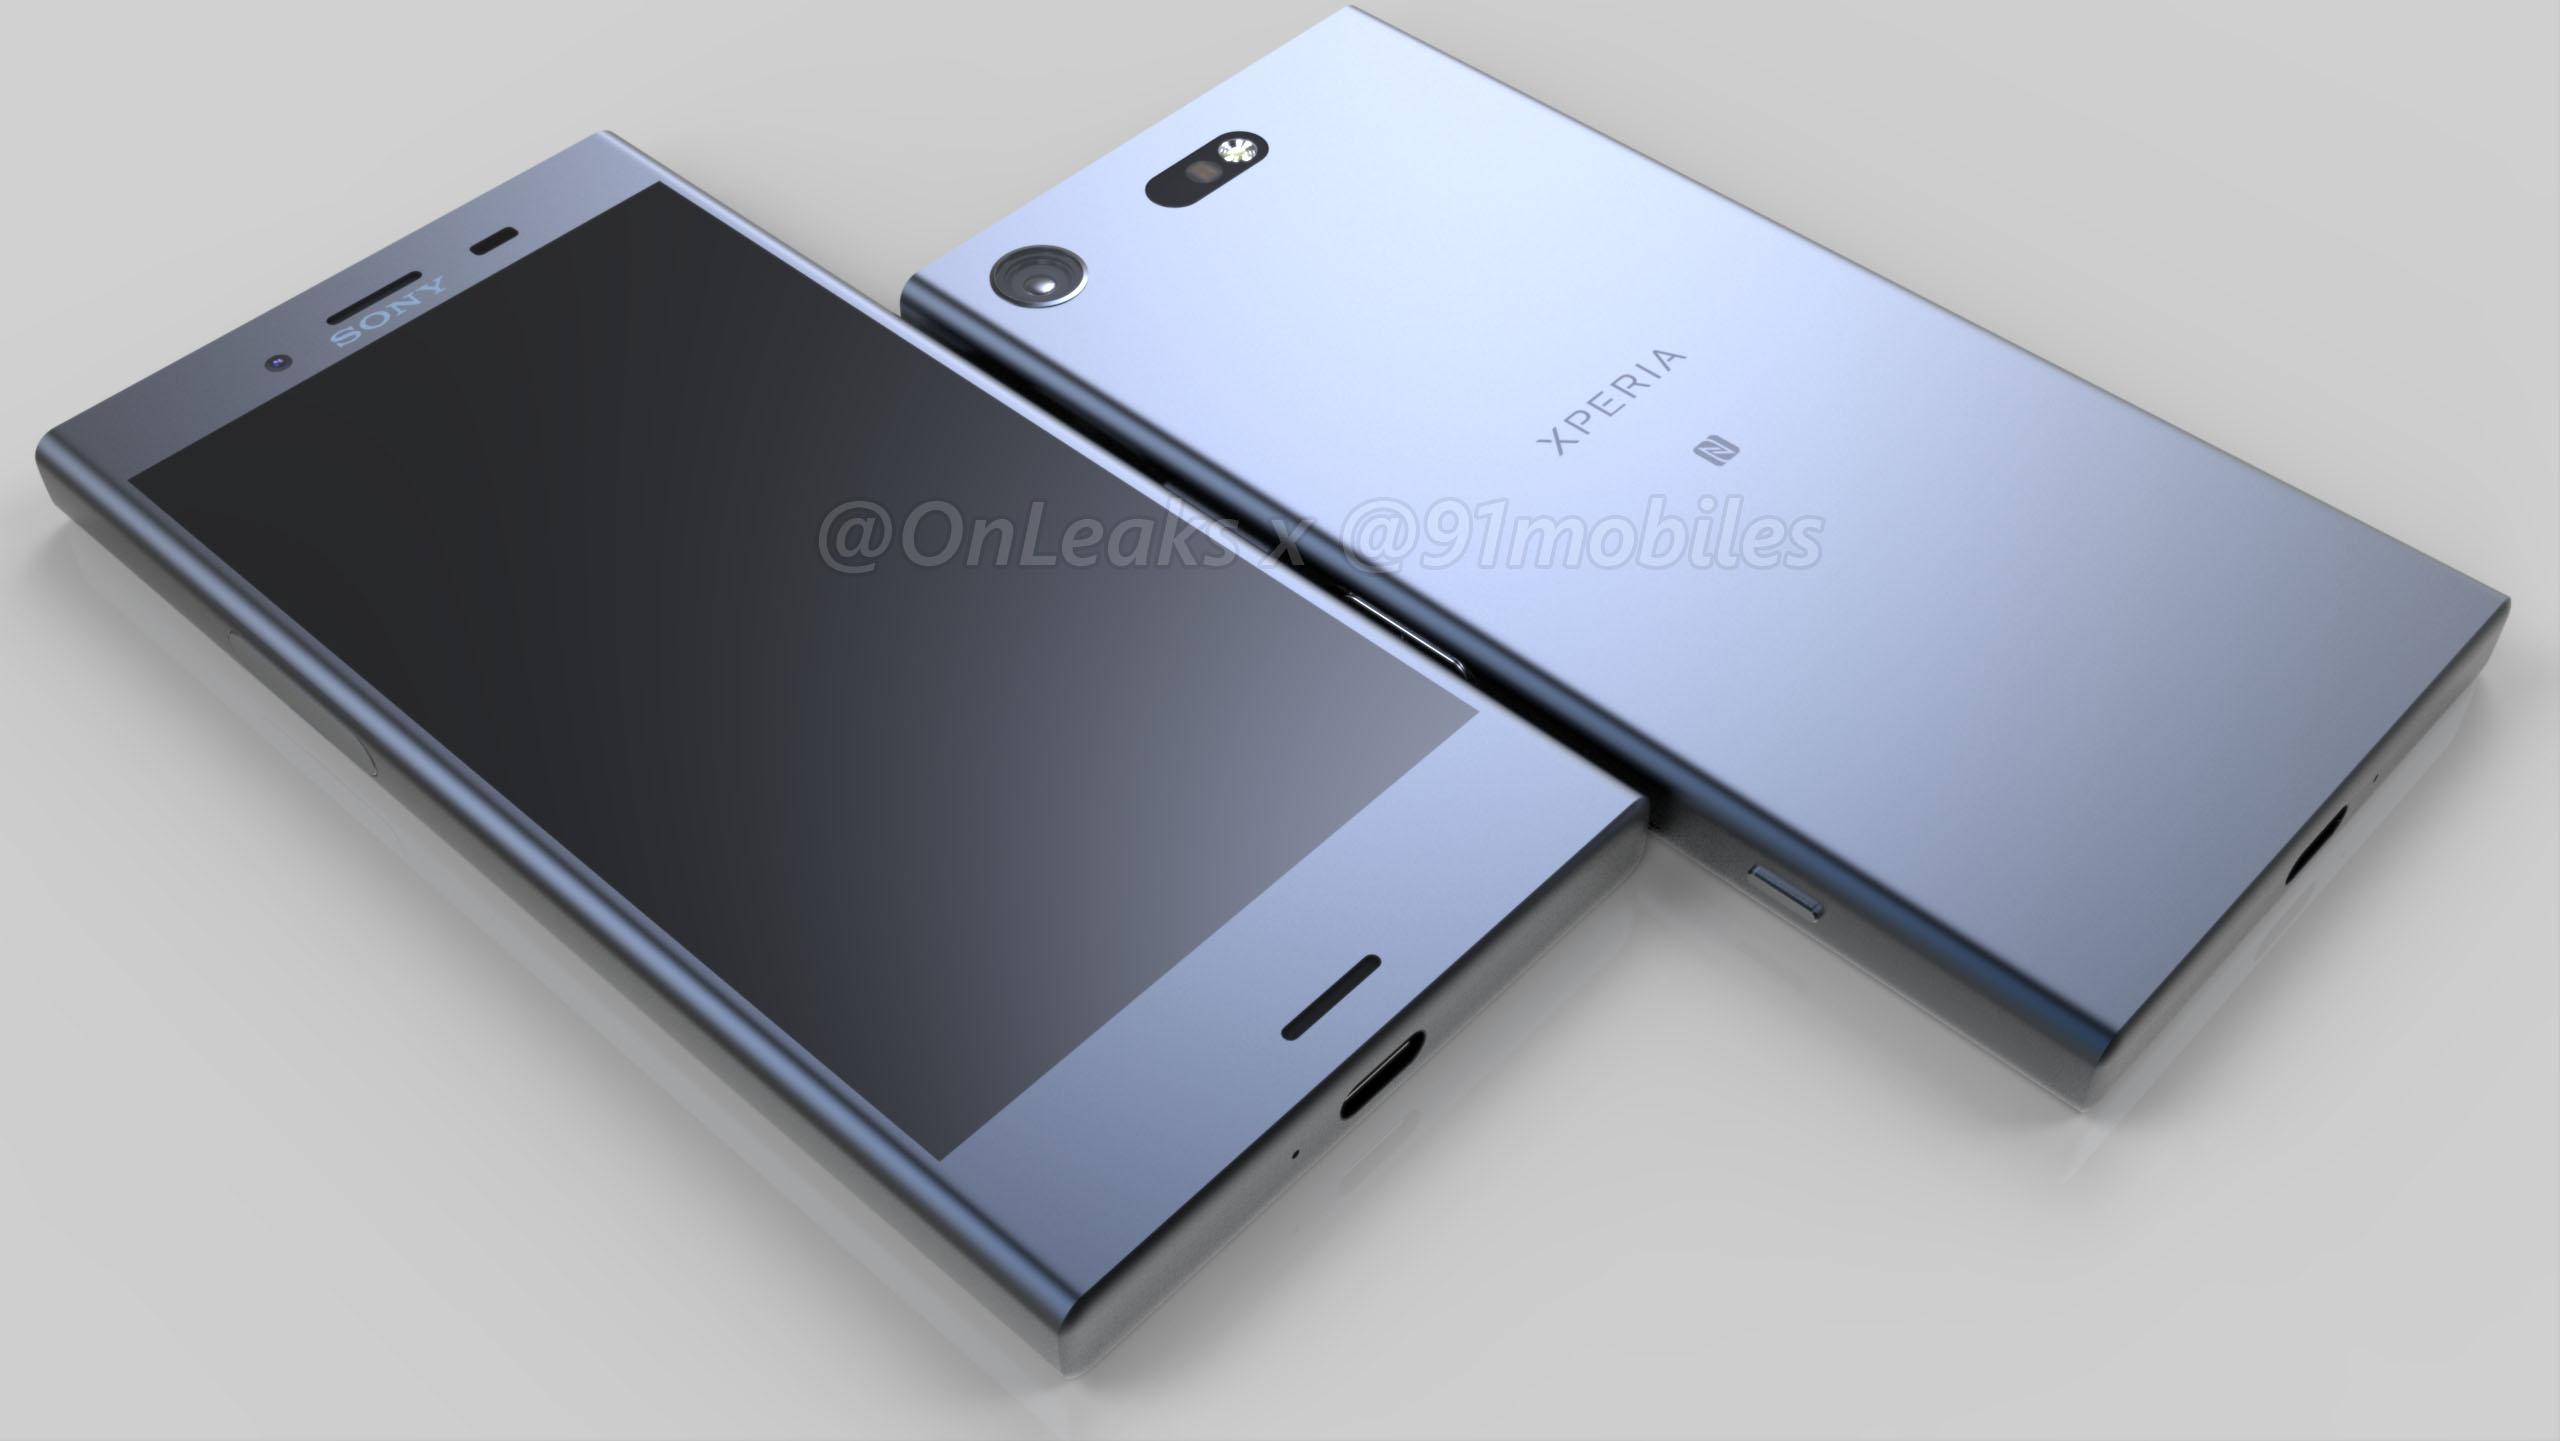 Sony Xperia XZ1 Compact exclusive leak 91mobiles (2)